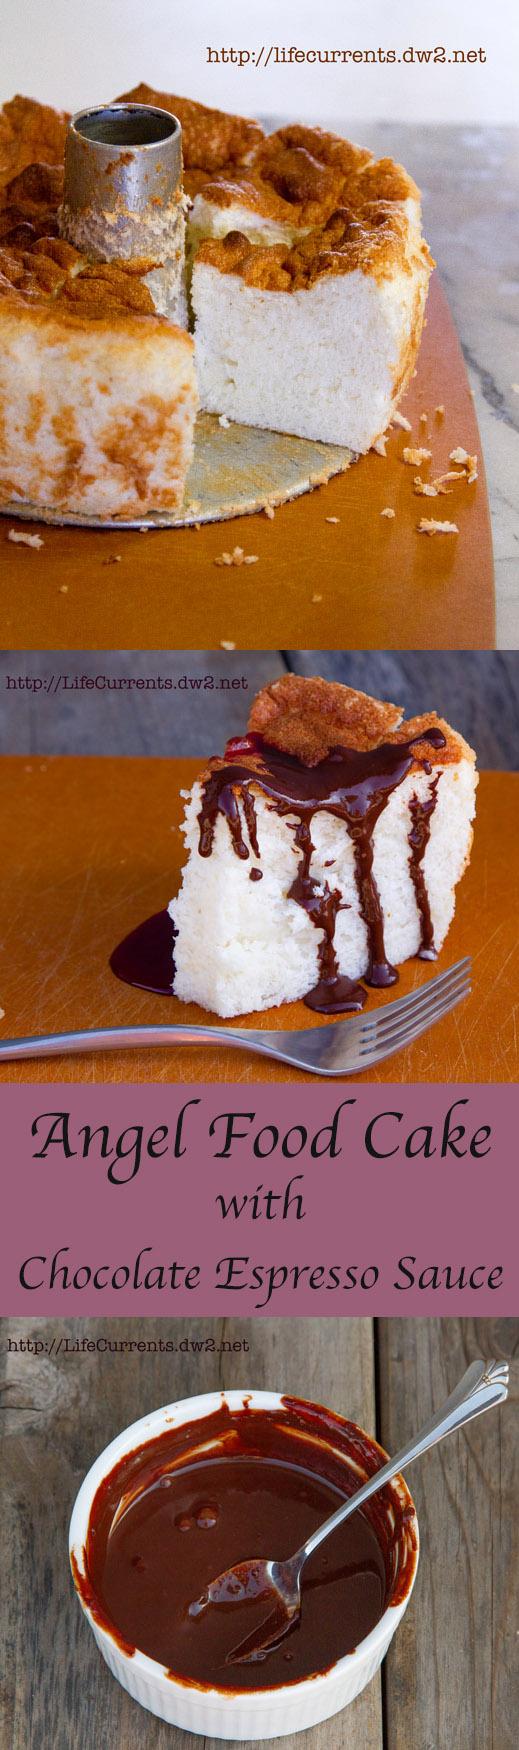 Classic Angel Food Cake recipe from Scratch just like Grandma made